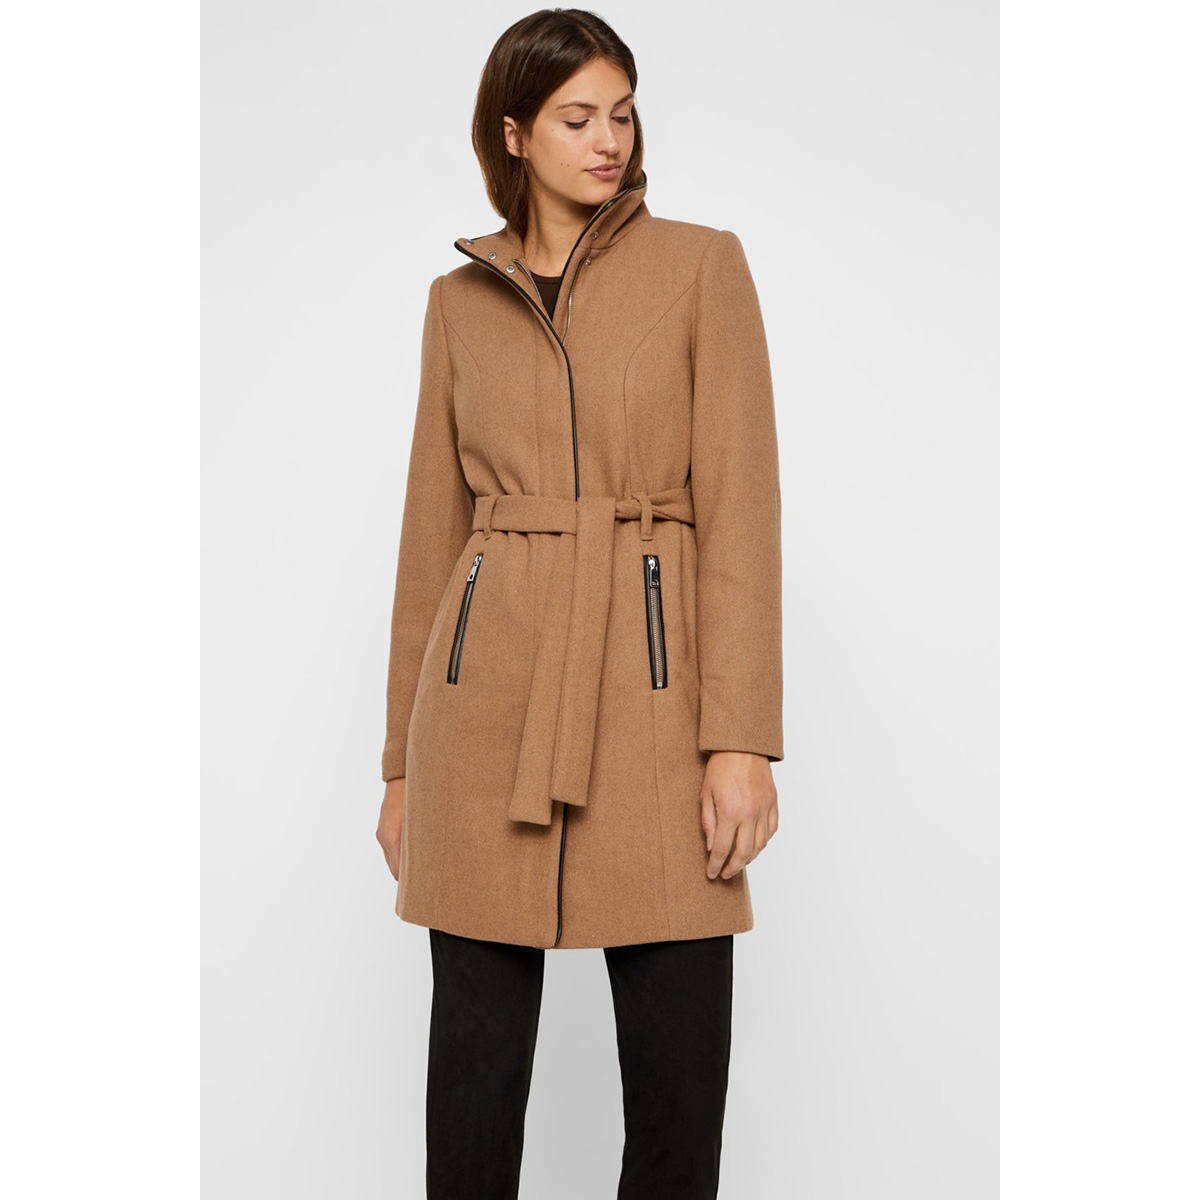 vmclassbessy 3/4 wool jacket ga noos 10199024 vero moda jas tigers eye